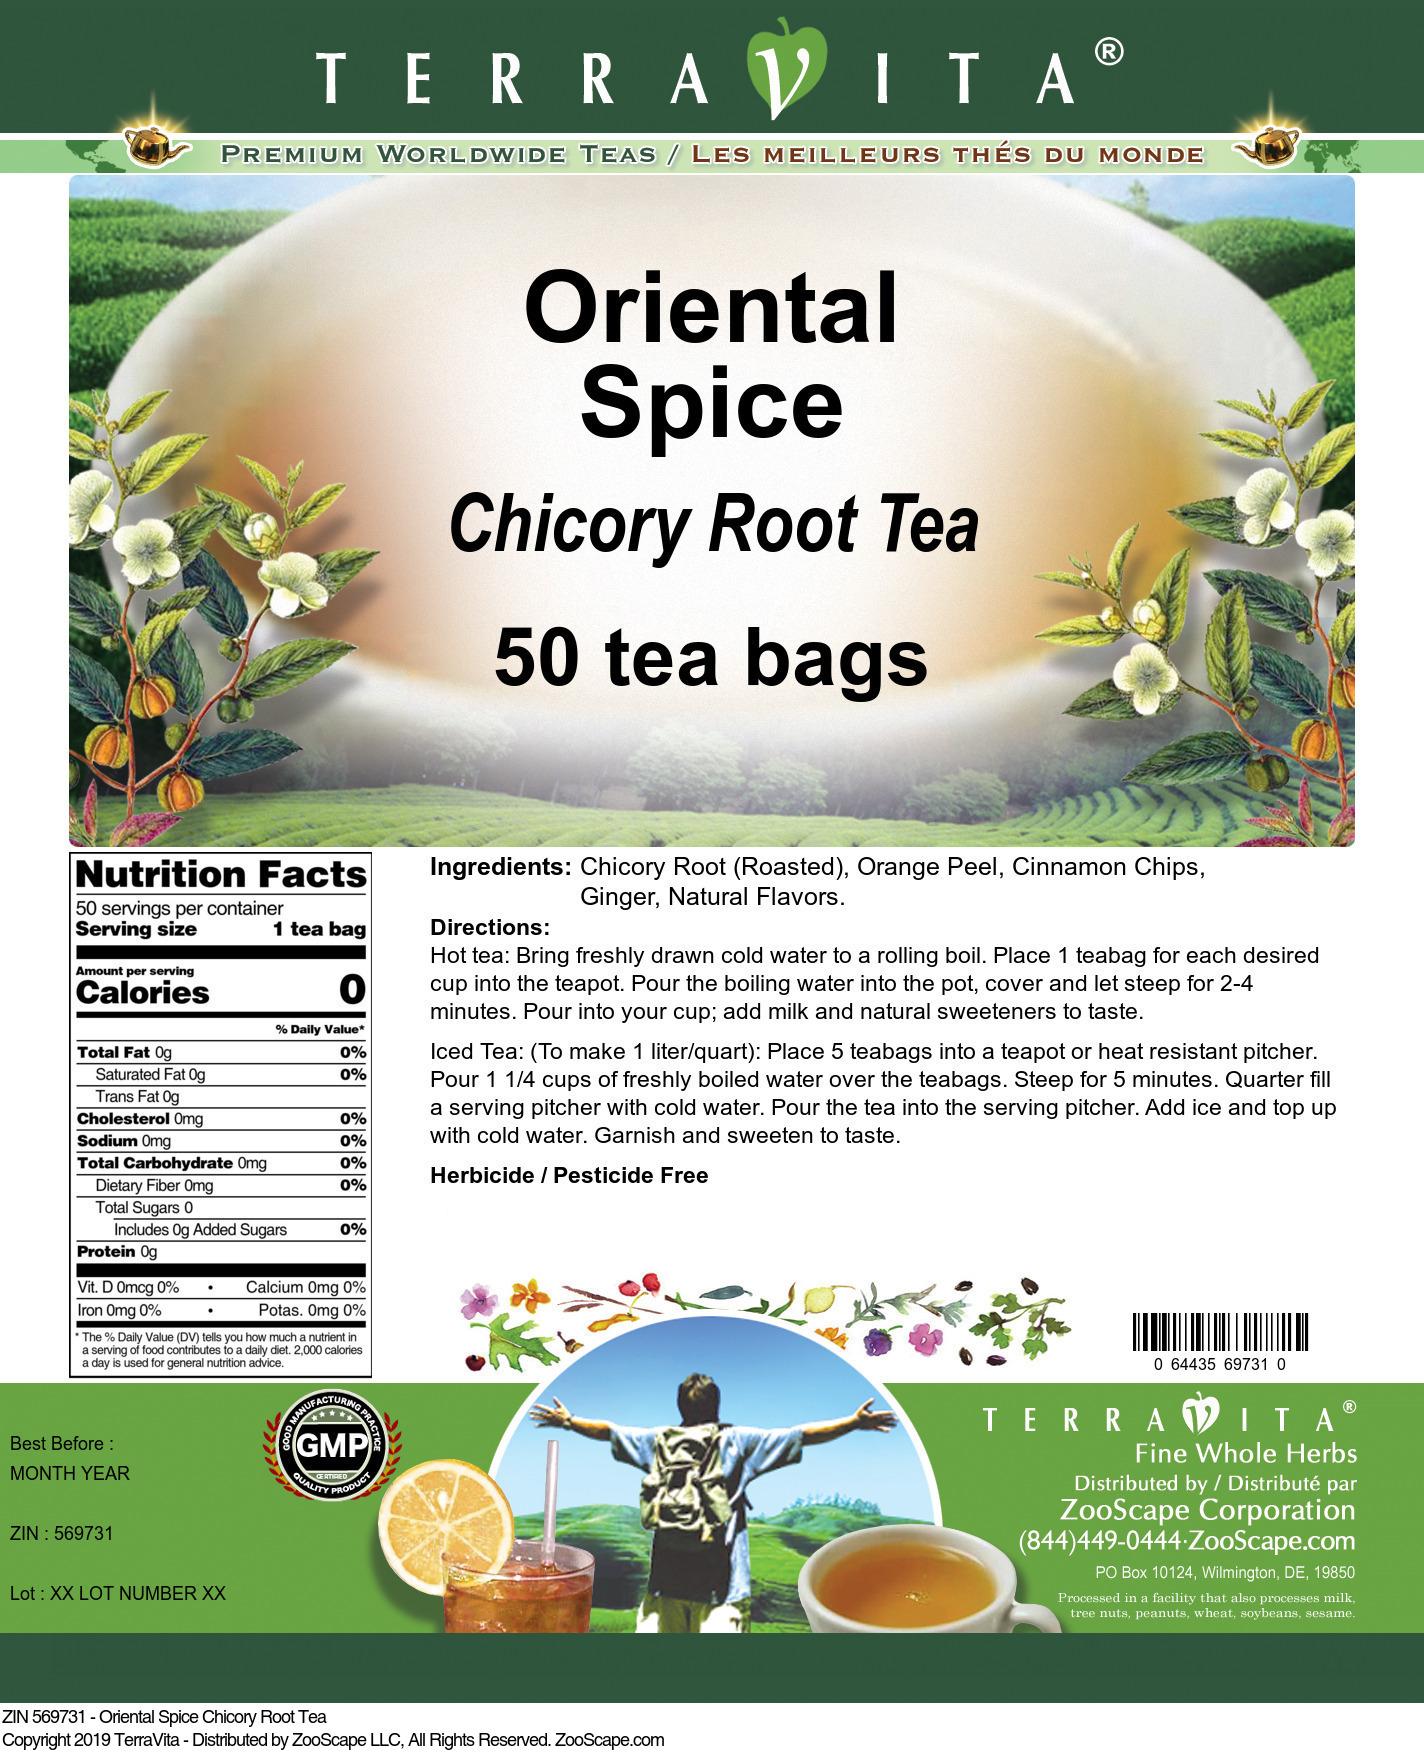 Oriental Spice Chicory Root Tea